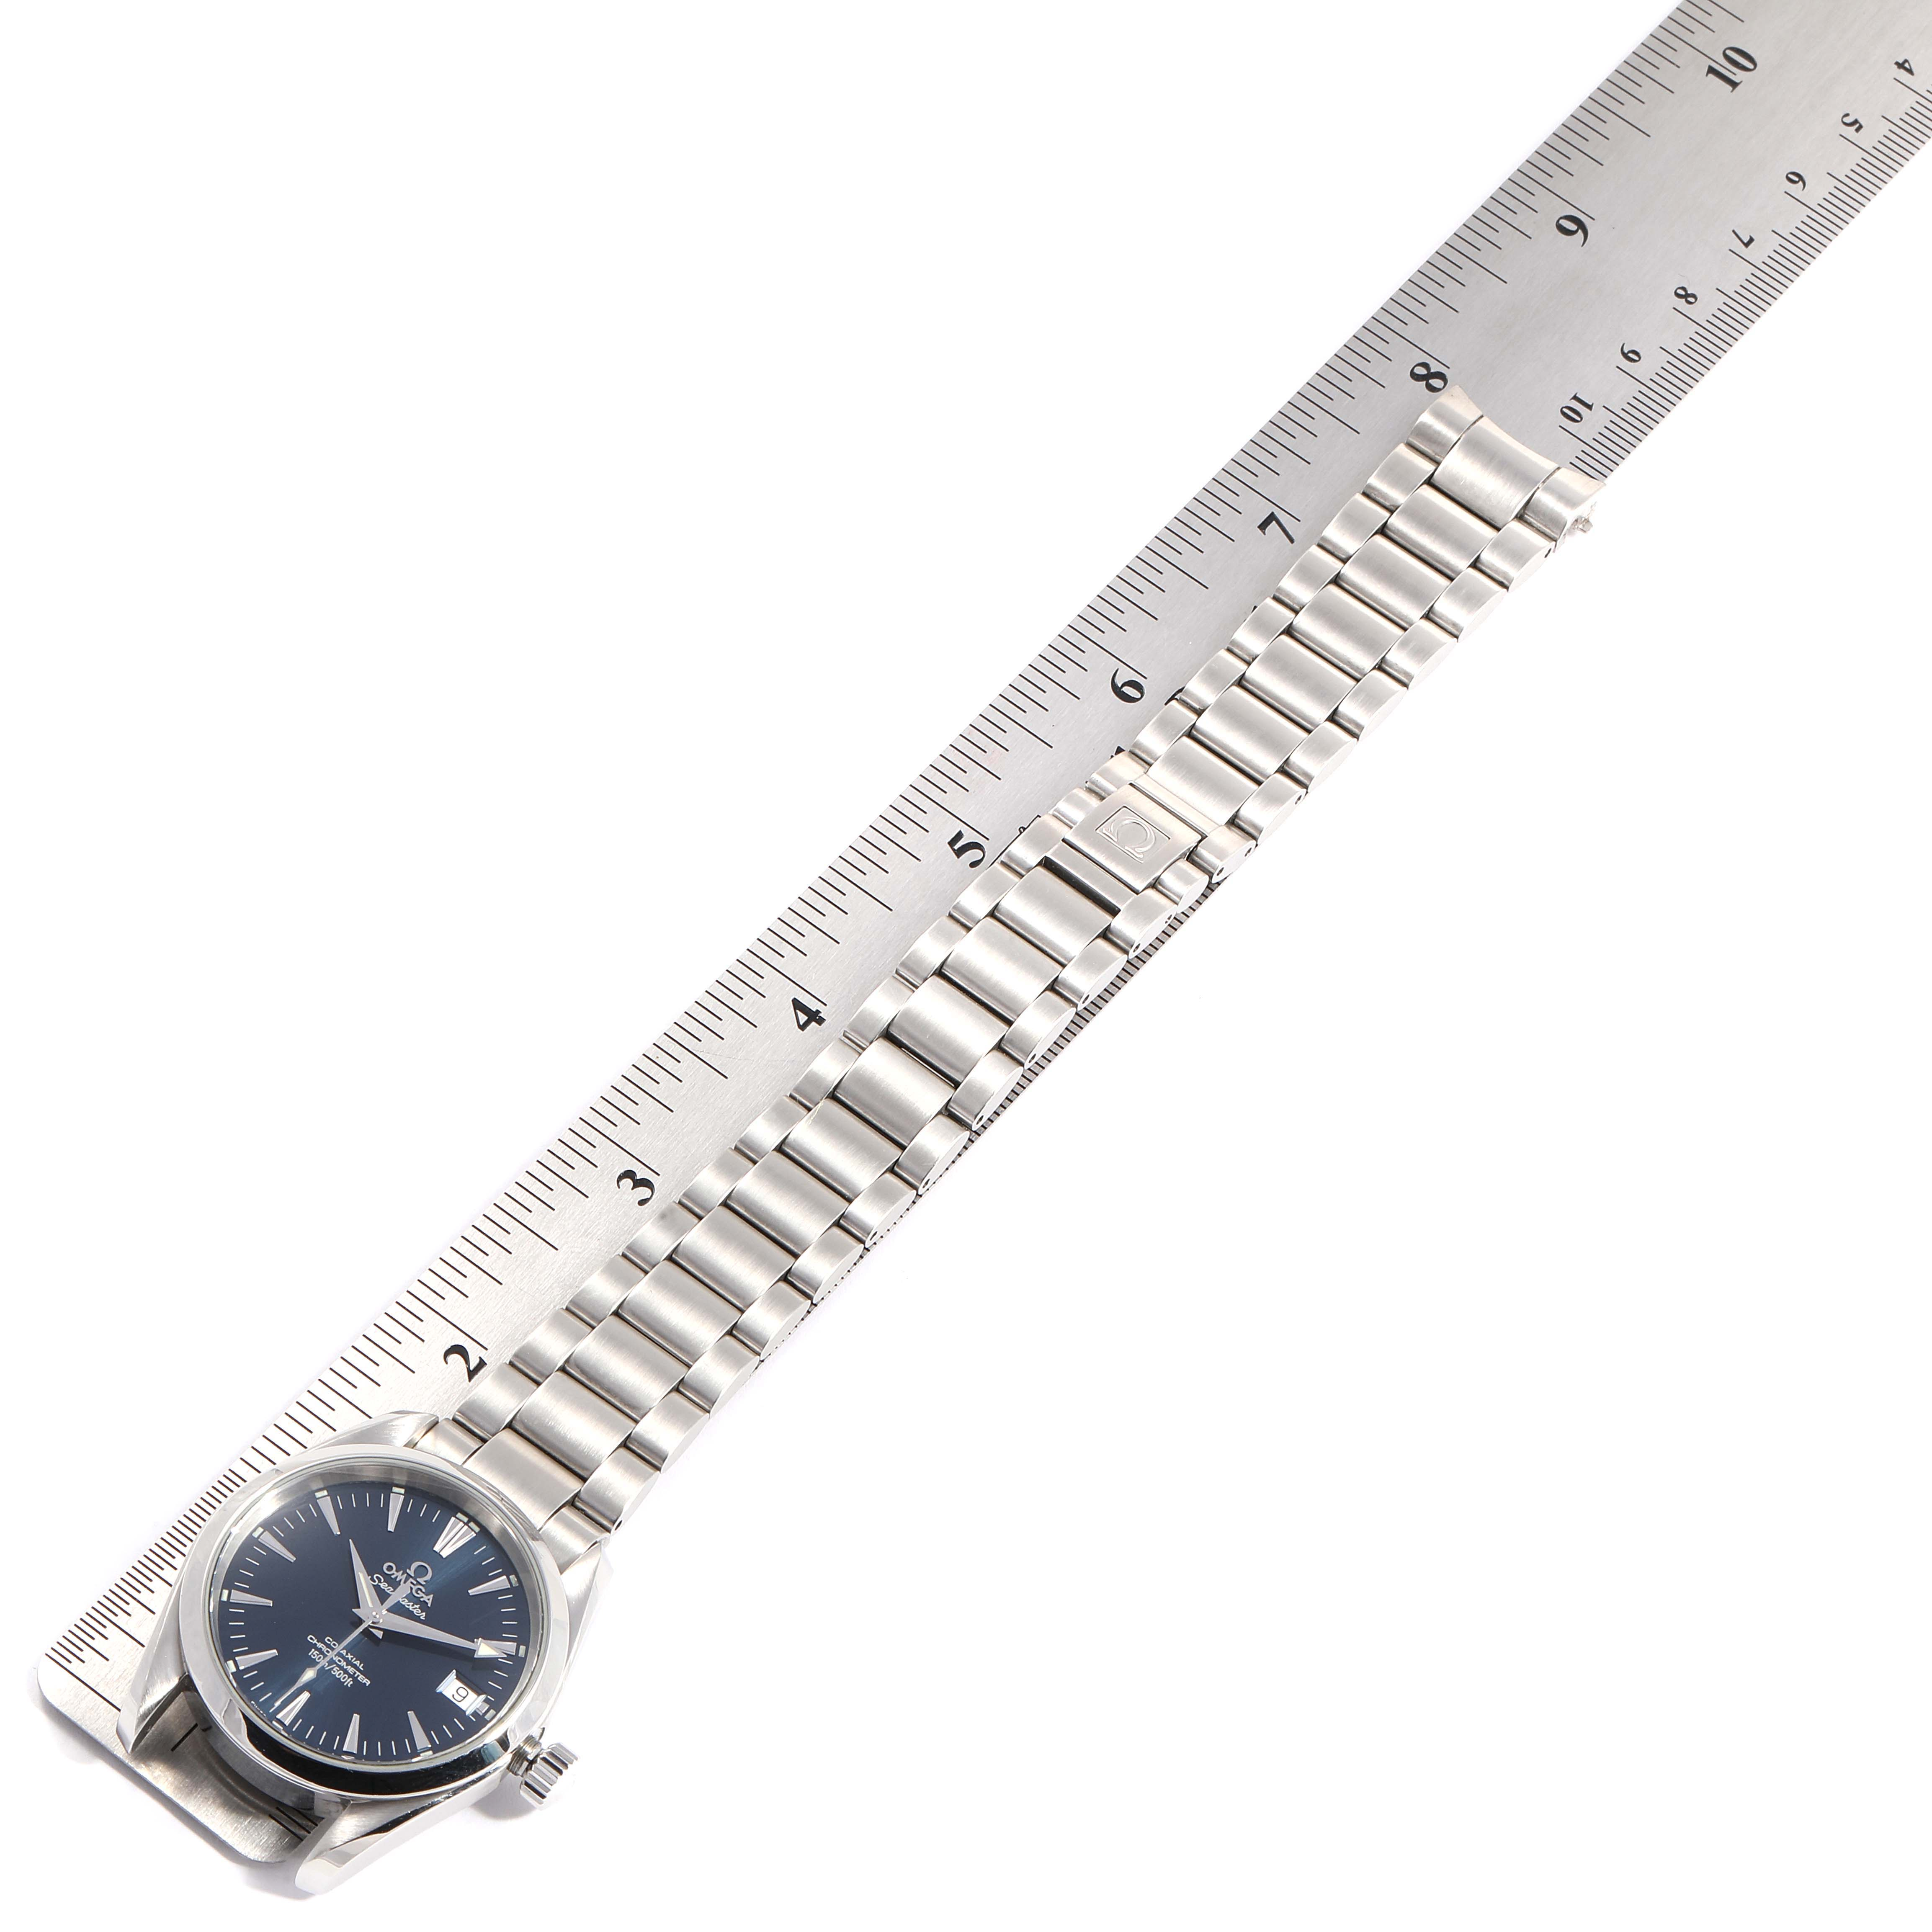 Omega Seamaster Aqua Terra 36 Blue Dial Steel Watch 2504.80.00 Box Card SwissWatchExpo